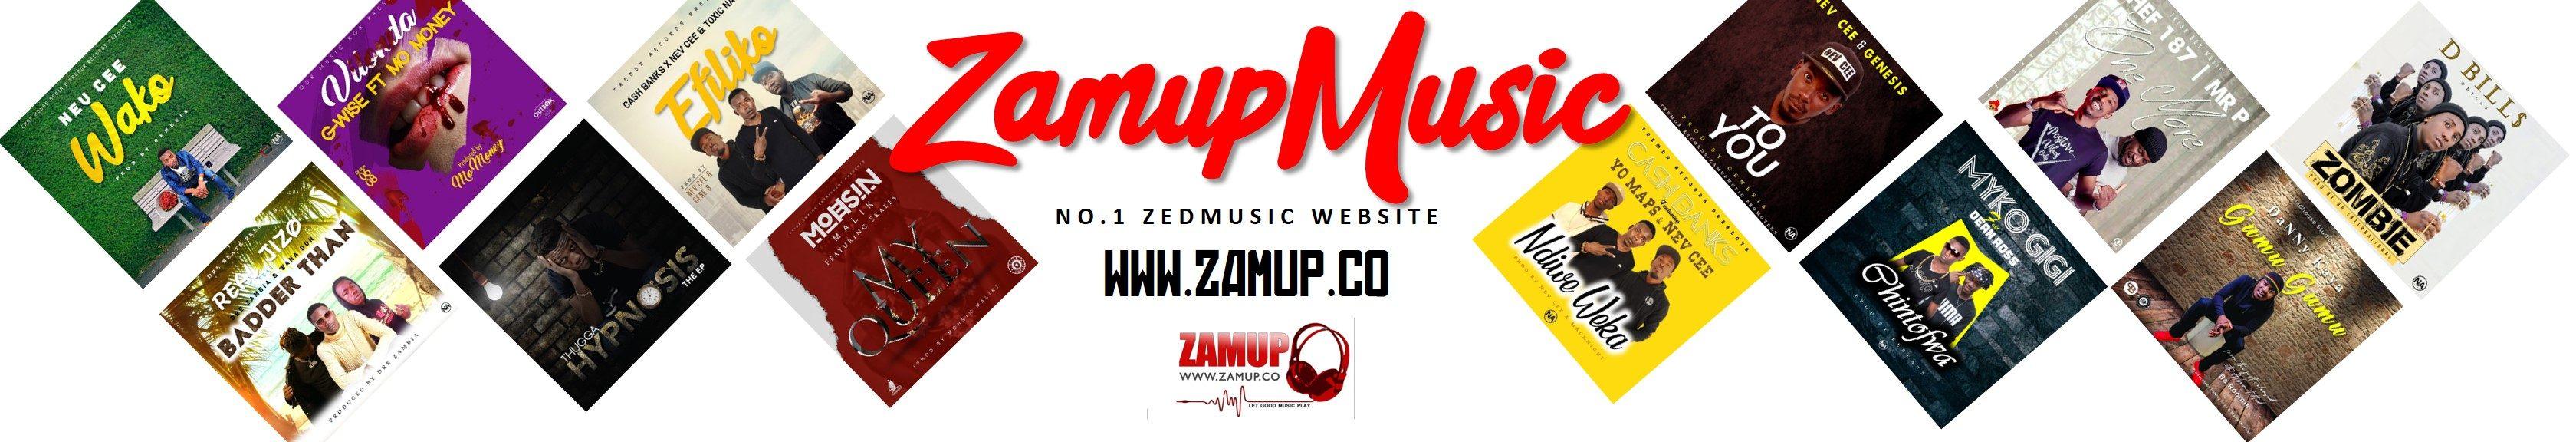 ZAMUP.CO